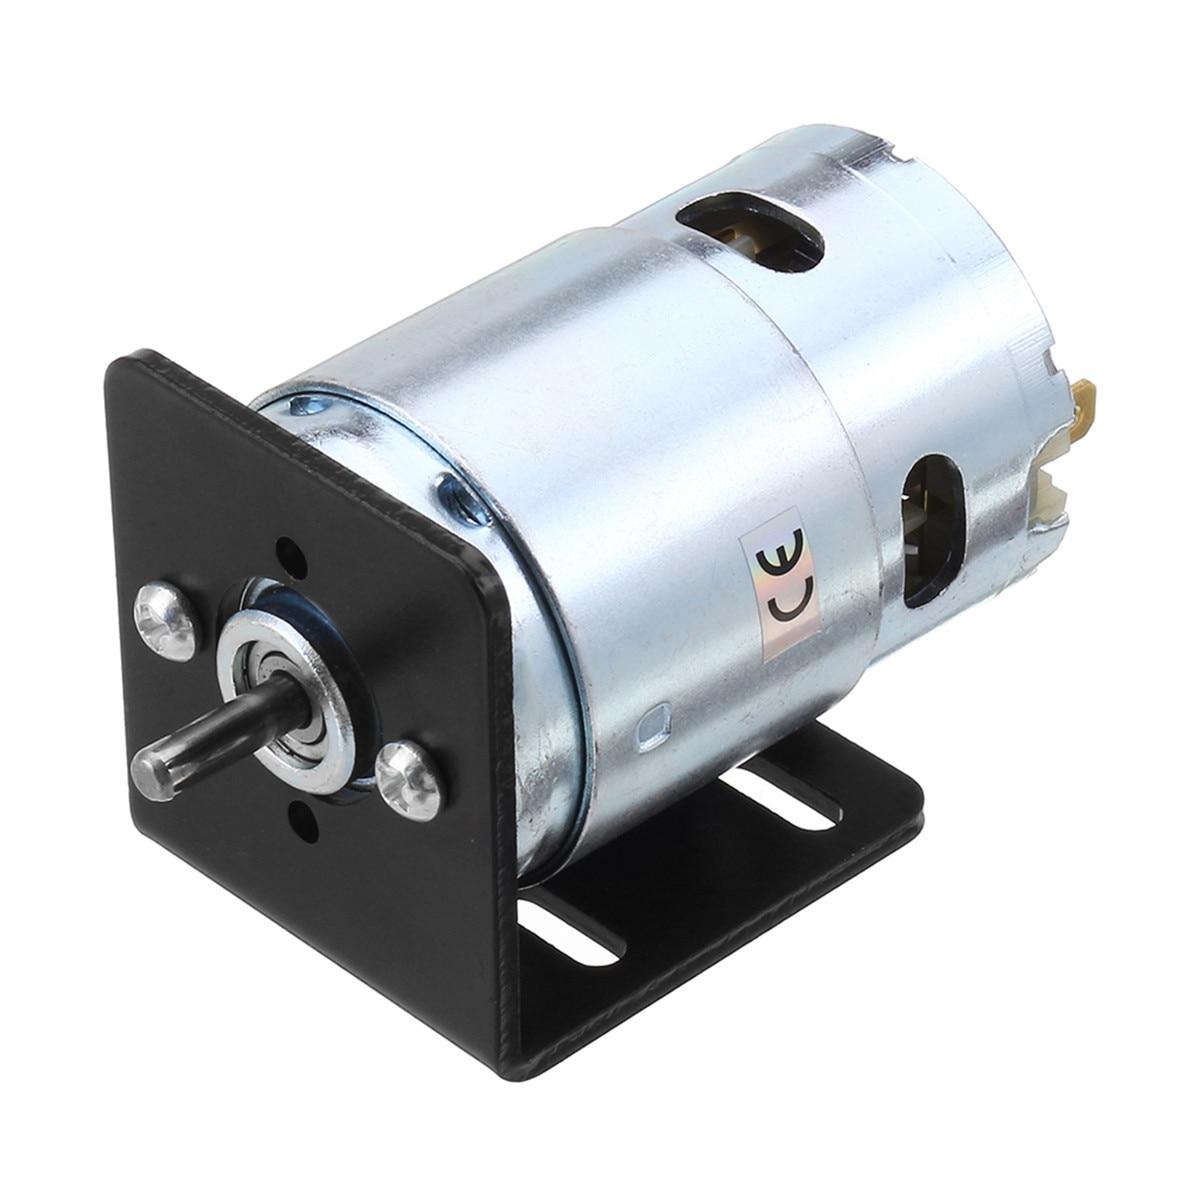 XNEMON 775 795 895 Motor Bracket / Gear Motor DC 12V-24V 3000-12000RPM Motor Large Torque Gear Motor